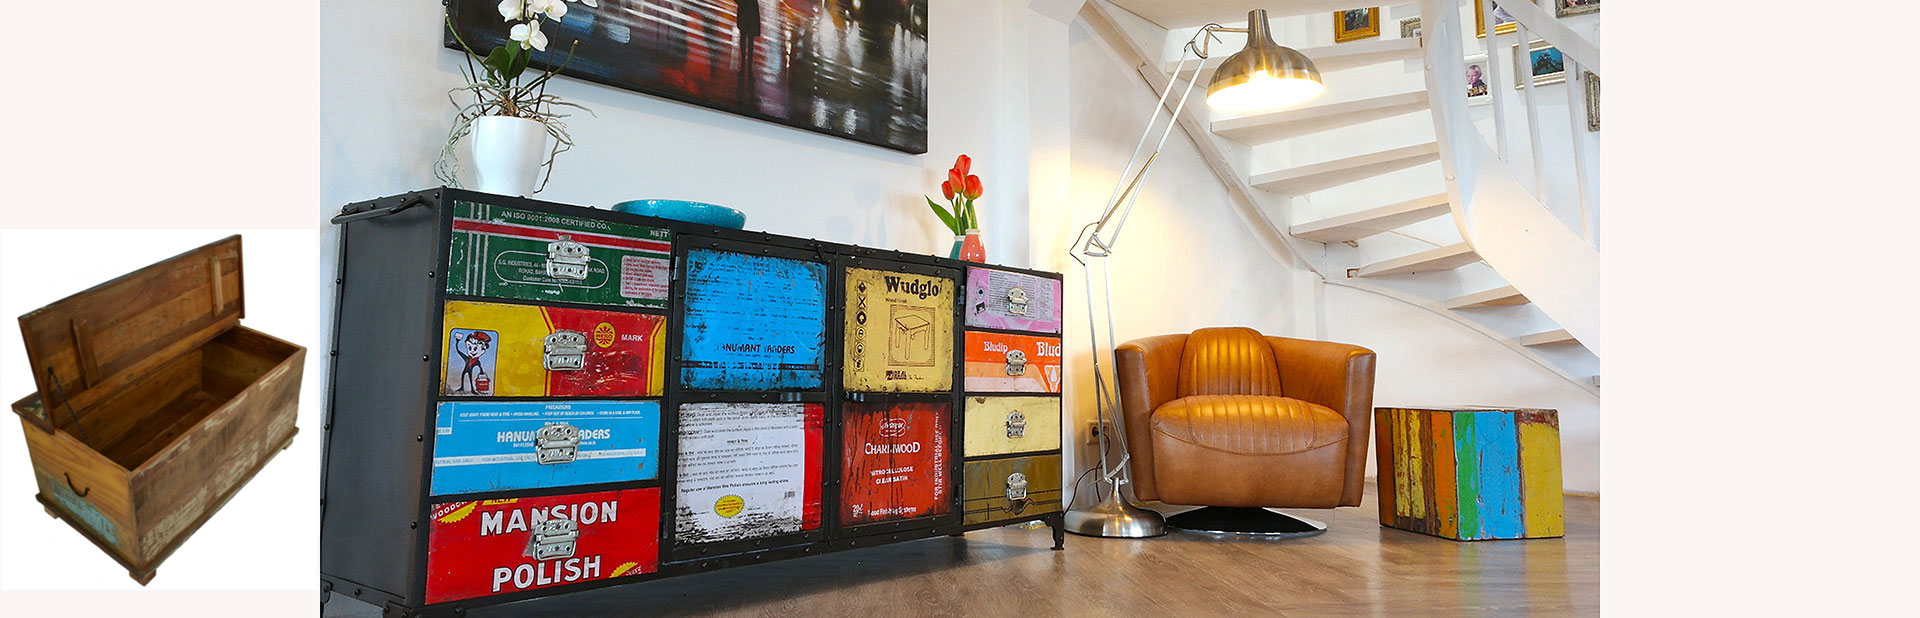 Designer Möbel Hannover - BEURBAN.DE - be urban - Möbel und Wohnkultur